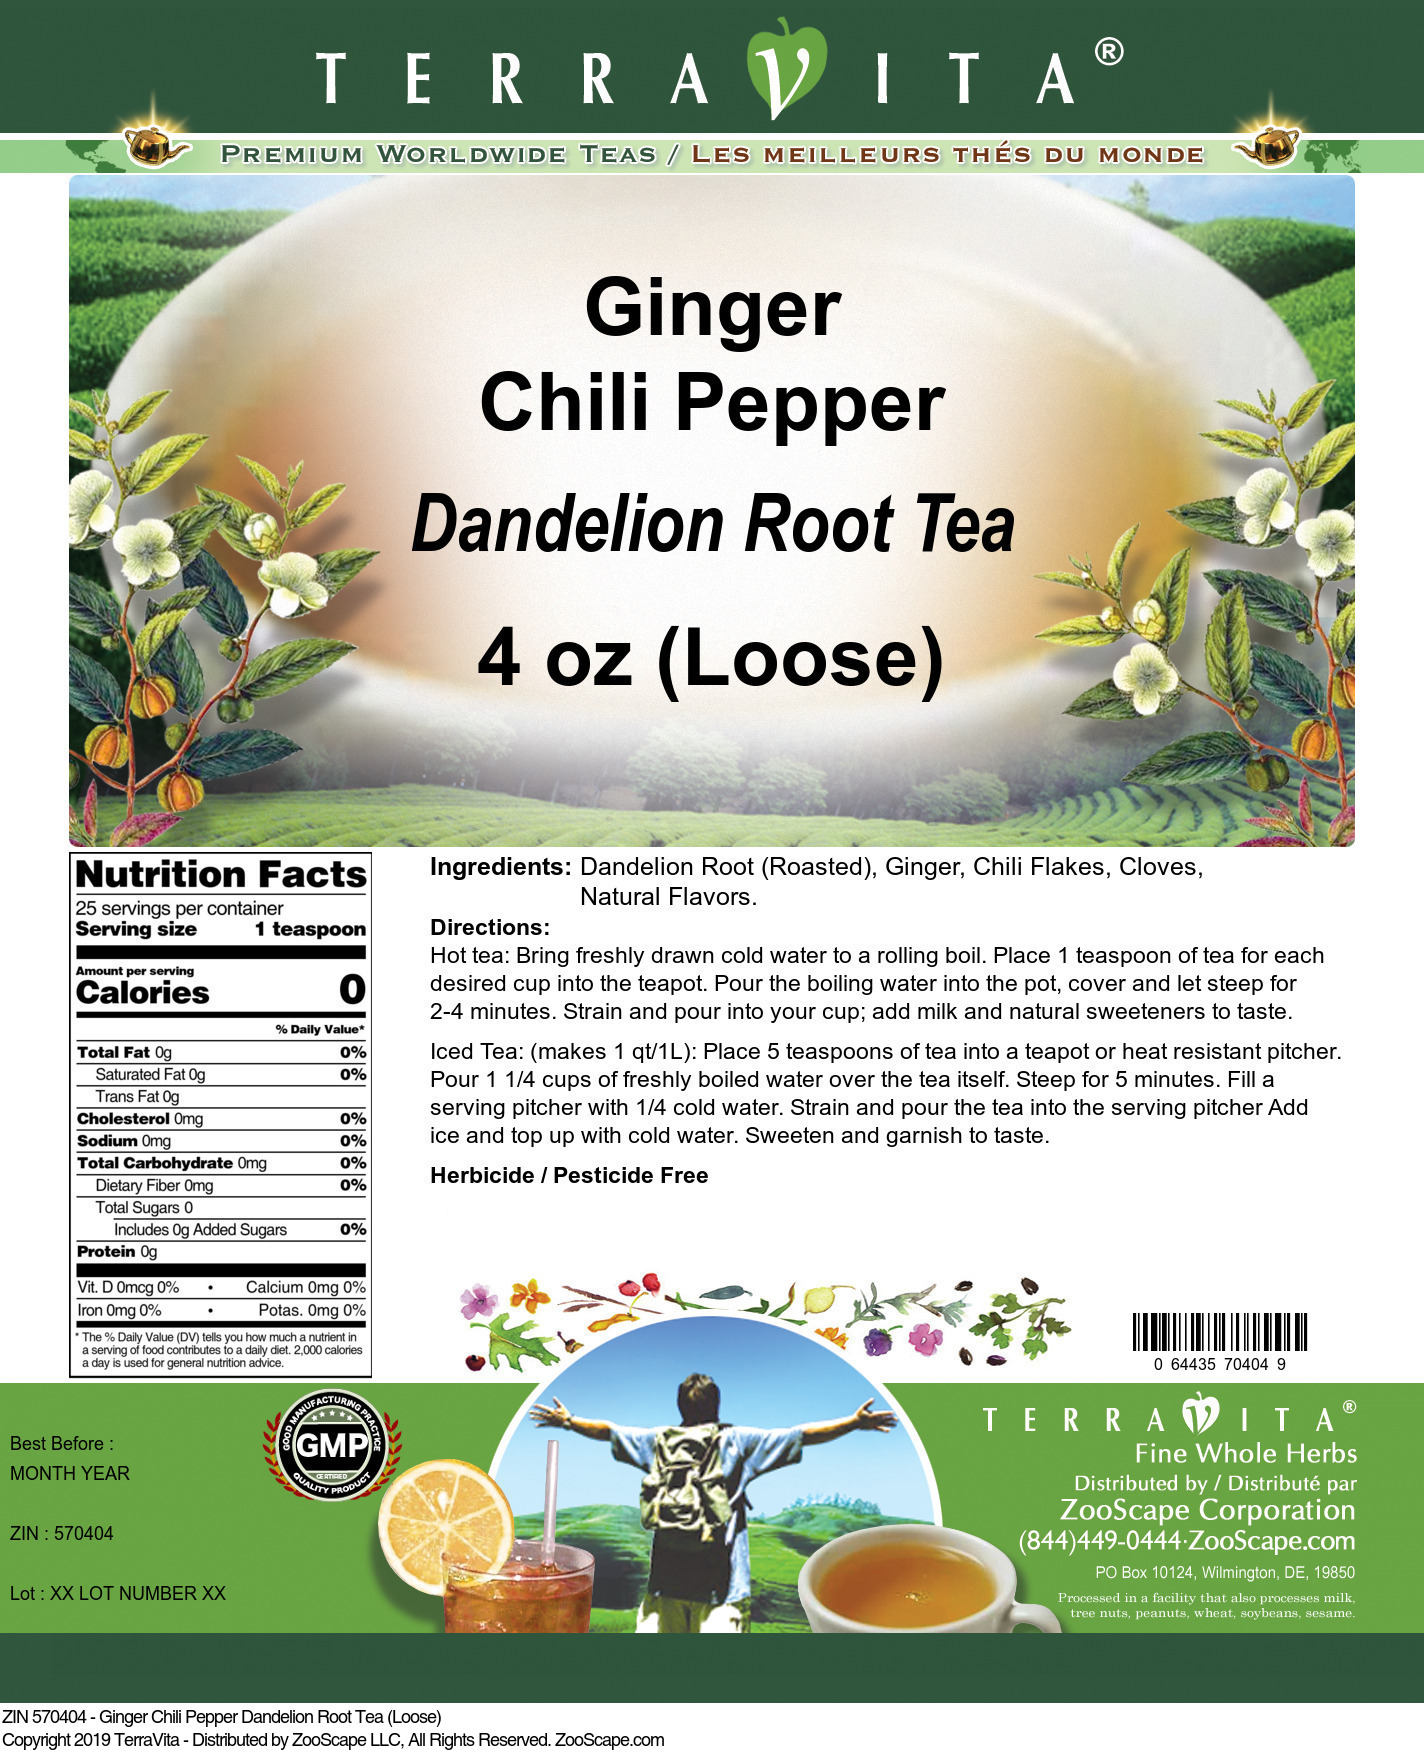 Ginger Chili Pepper Dandelion Root Tea (Loose)